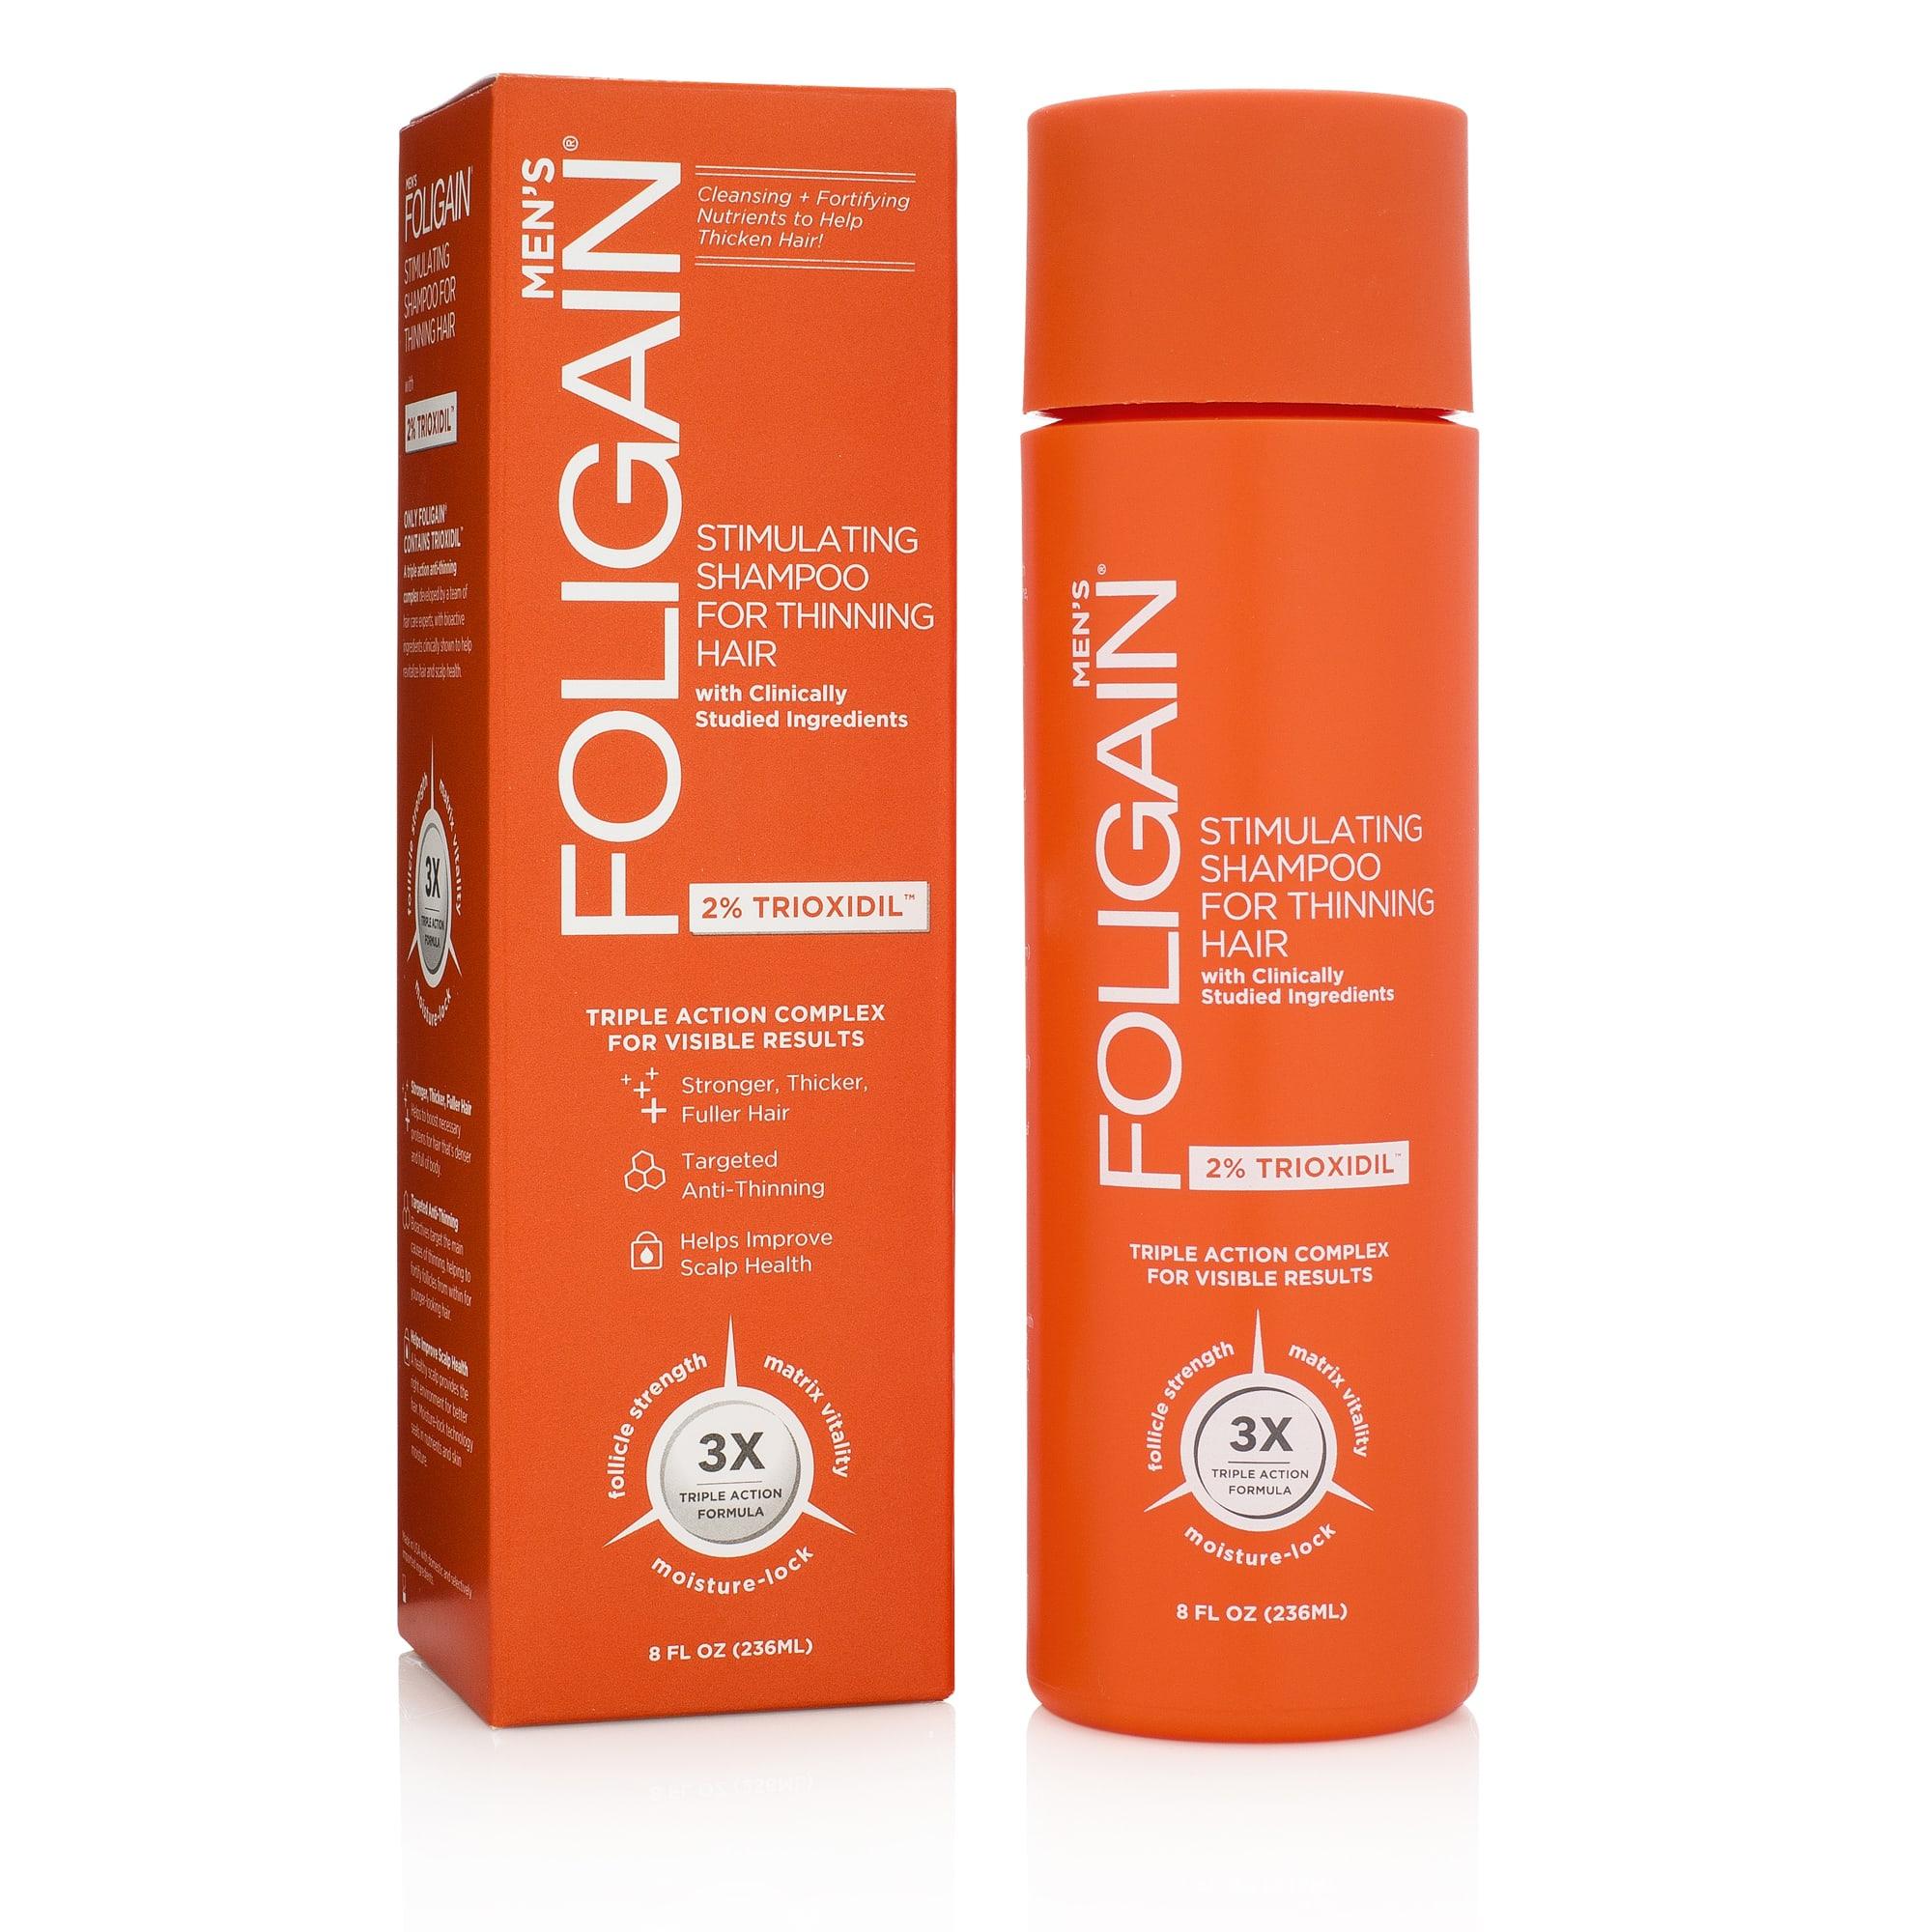 Šampón proti padaniu vlasov pre mužov Foligain